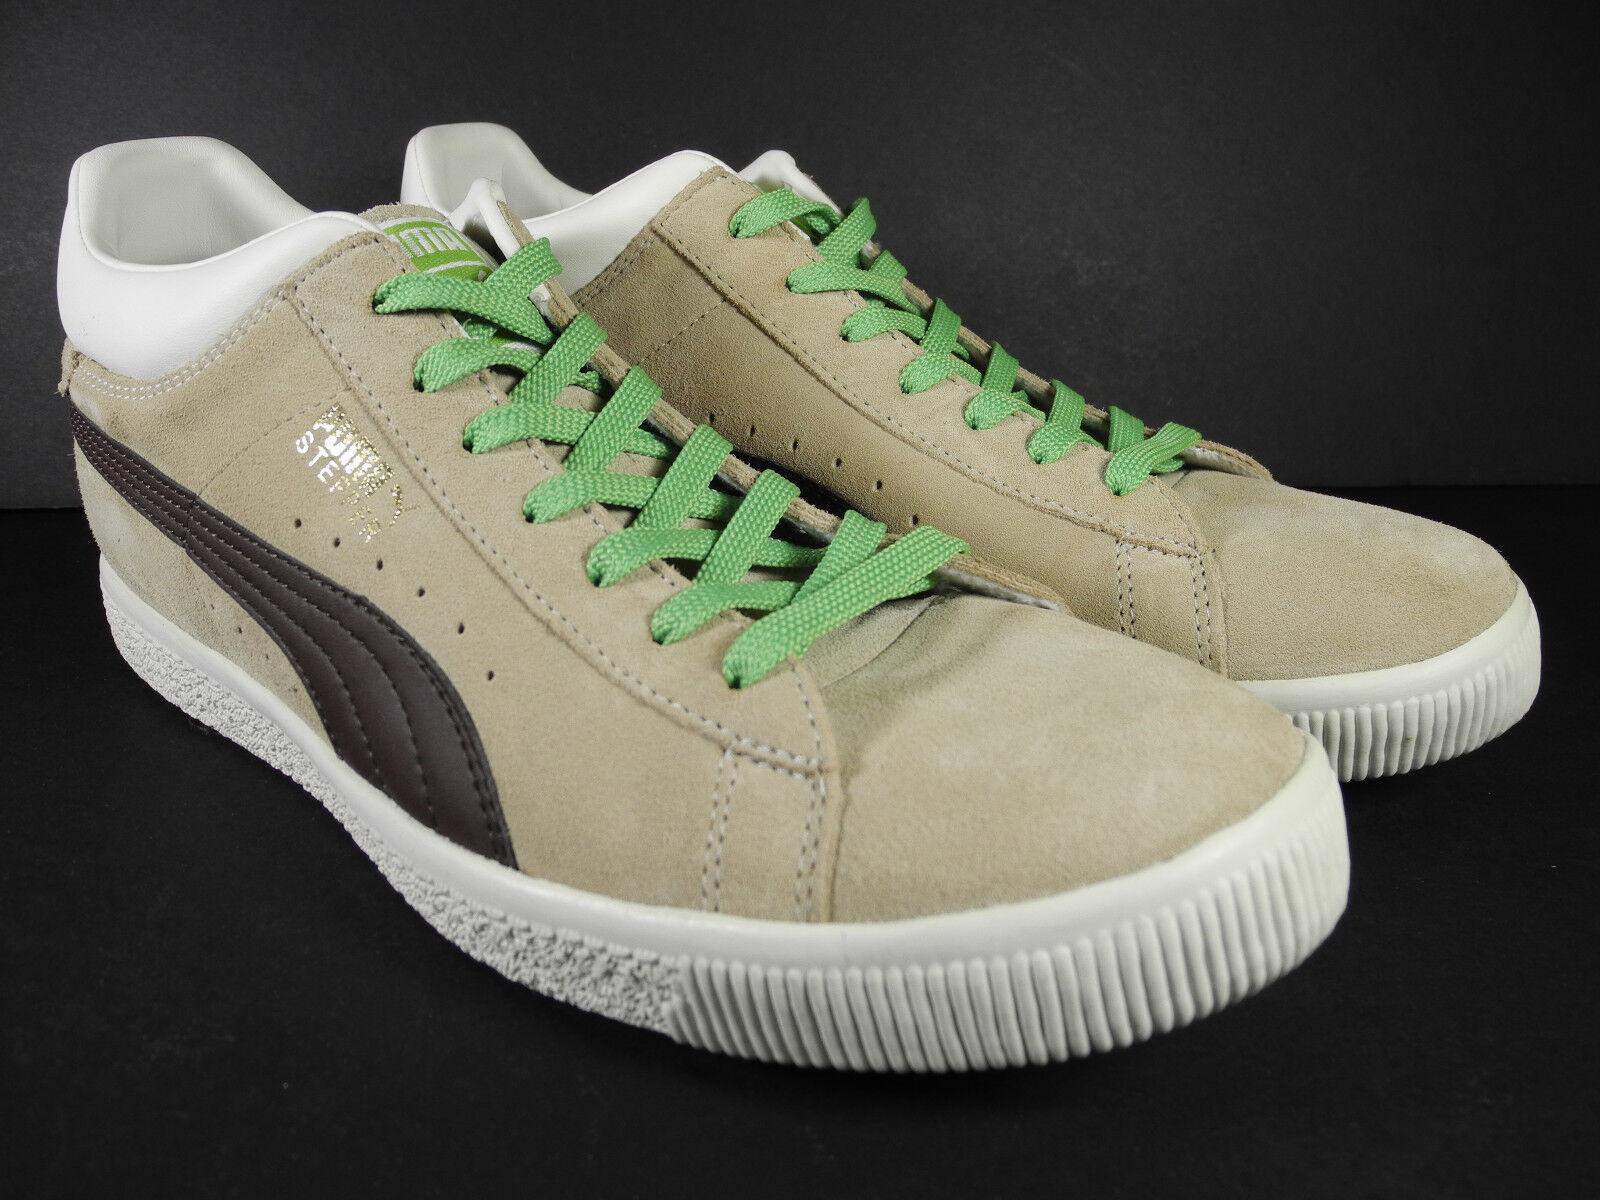 Nuevos Gamuza Zapatos De Gamuza Nuevos Para Hombre Puma STEPPER 77a2f9